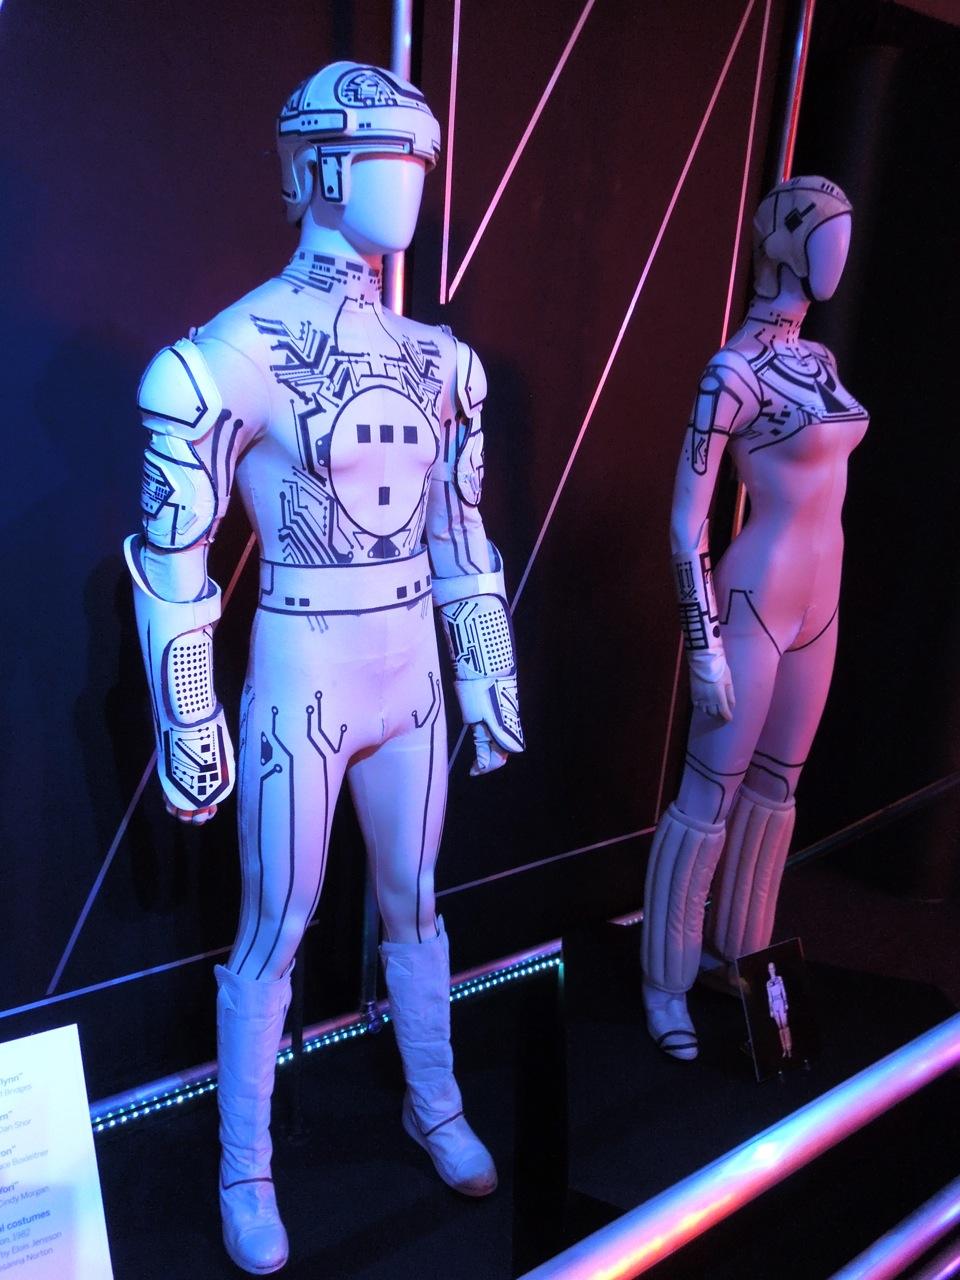 original 1982 tron movie costumes on display. Black Bedroom Furniture Sets. Home Design Ideas